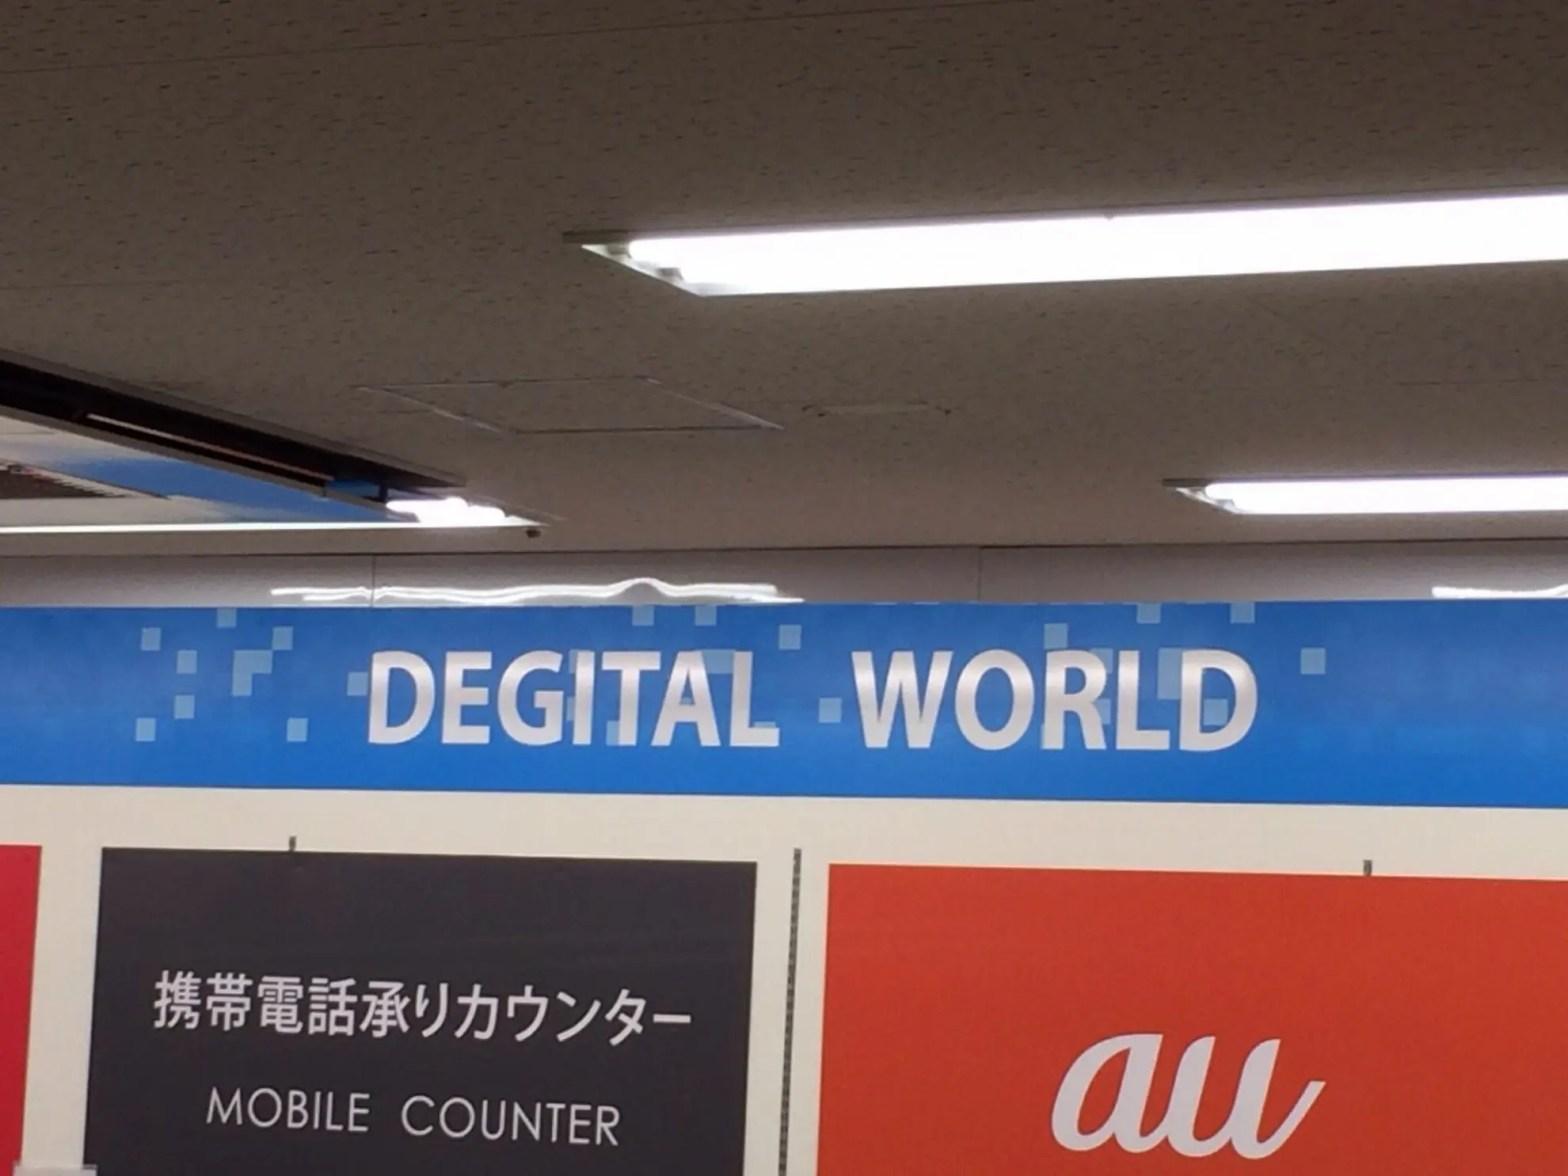 Engrish in Japan